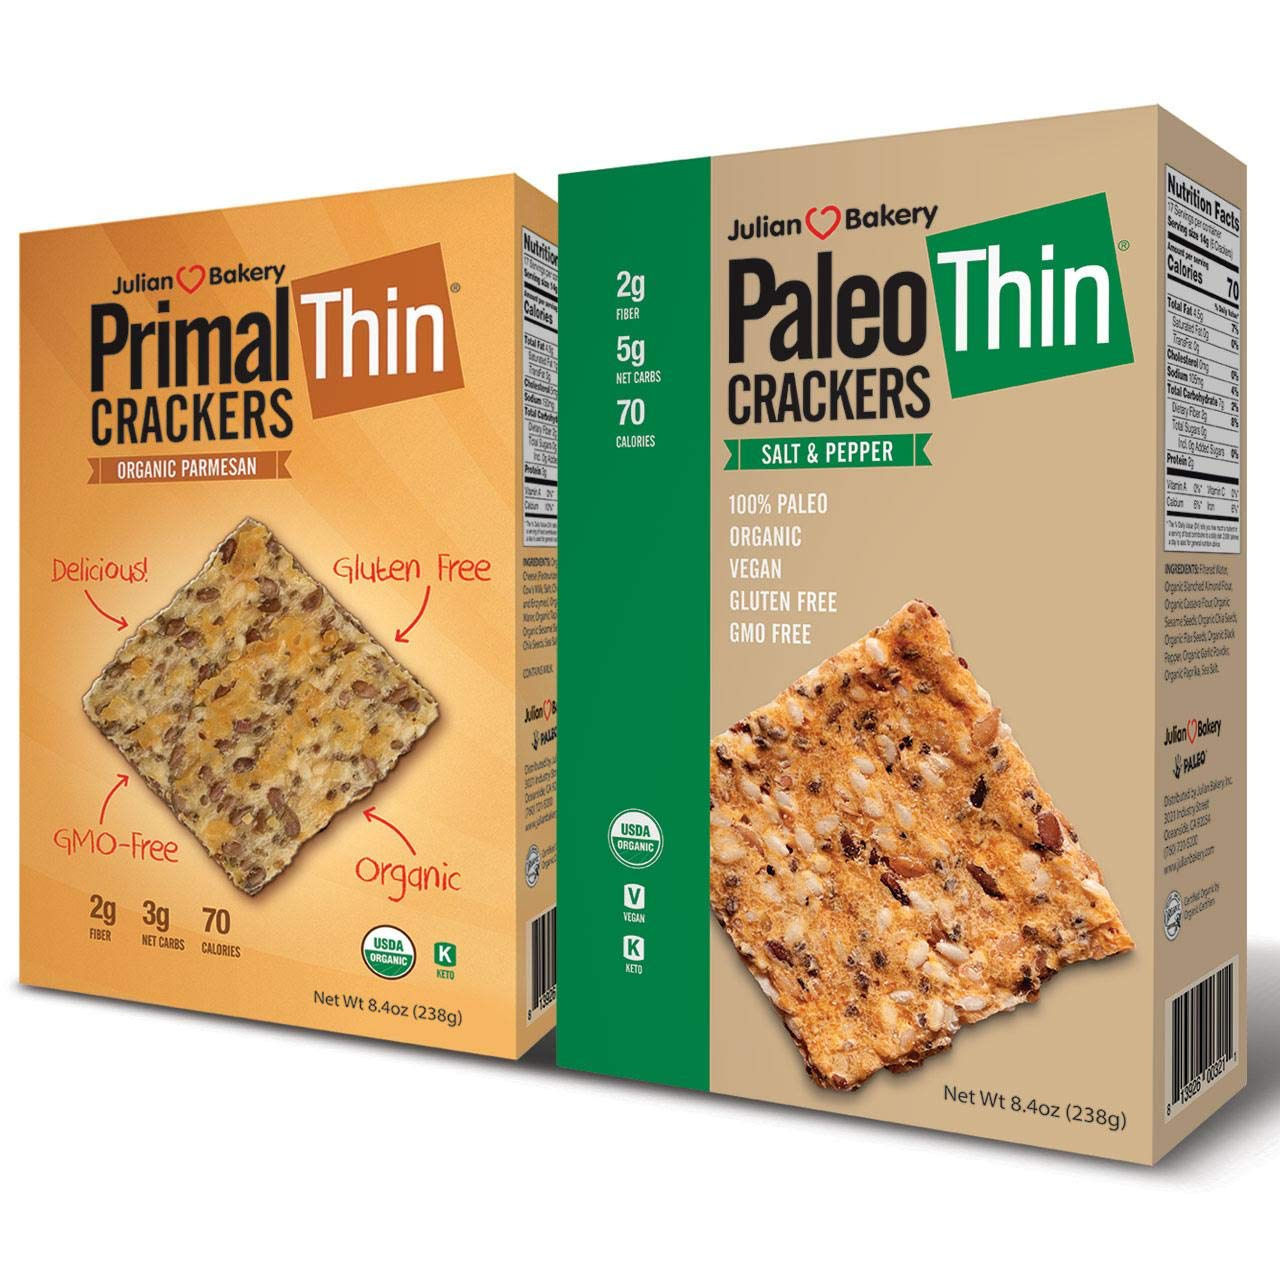 Paleo & Primal Thin Crackers) (Salt & Pepper & Parmesan) (Organic, Low Carb, Gluten-Free, Grain-Free)(Variety 2 Pack) by Julian Bakery